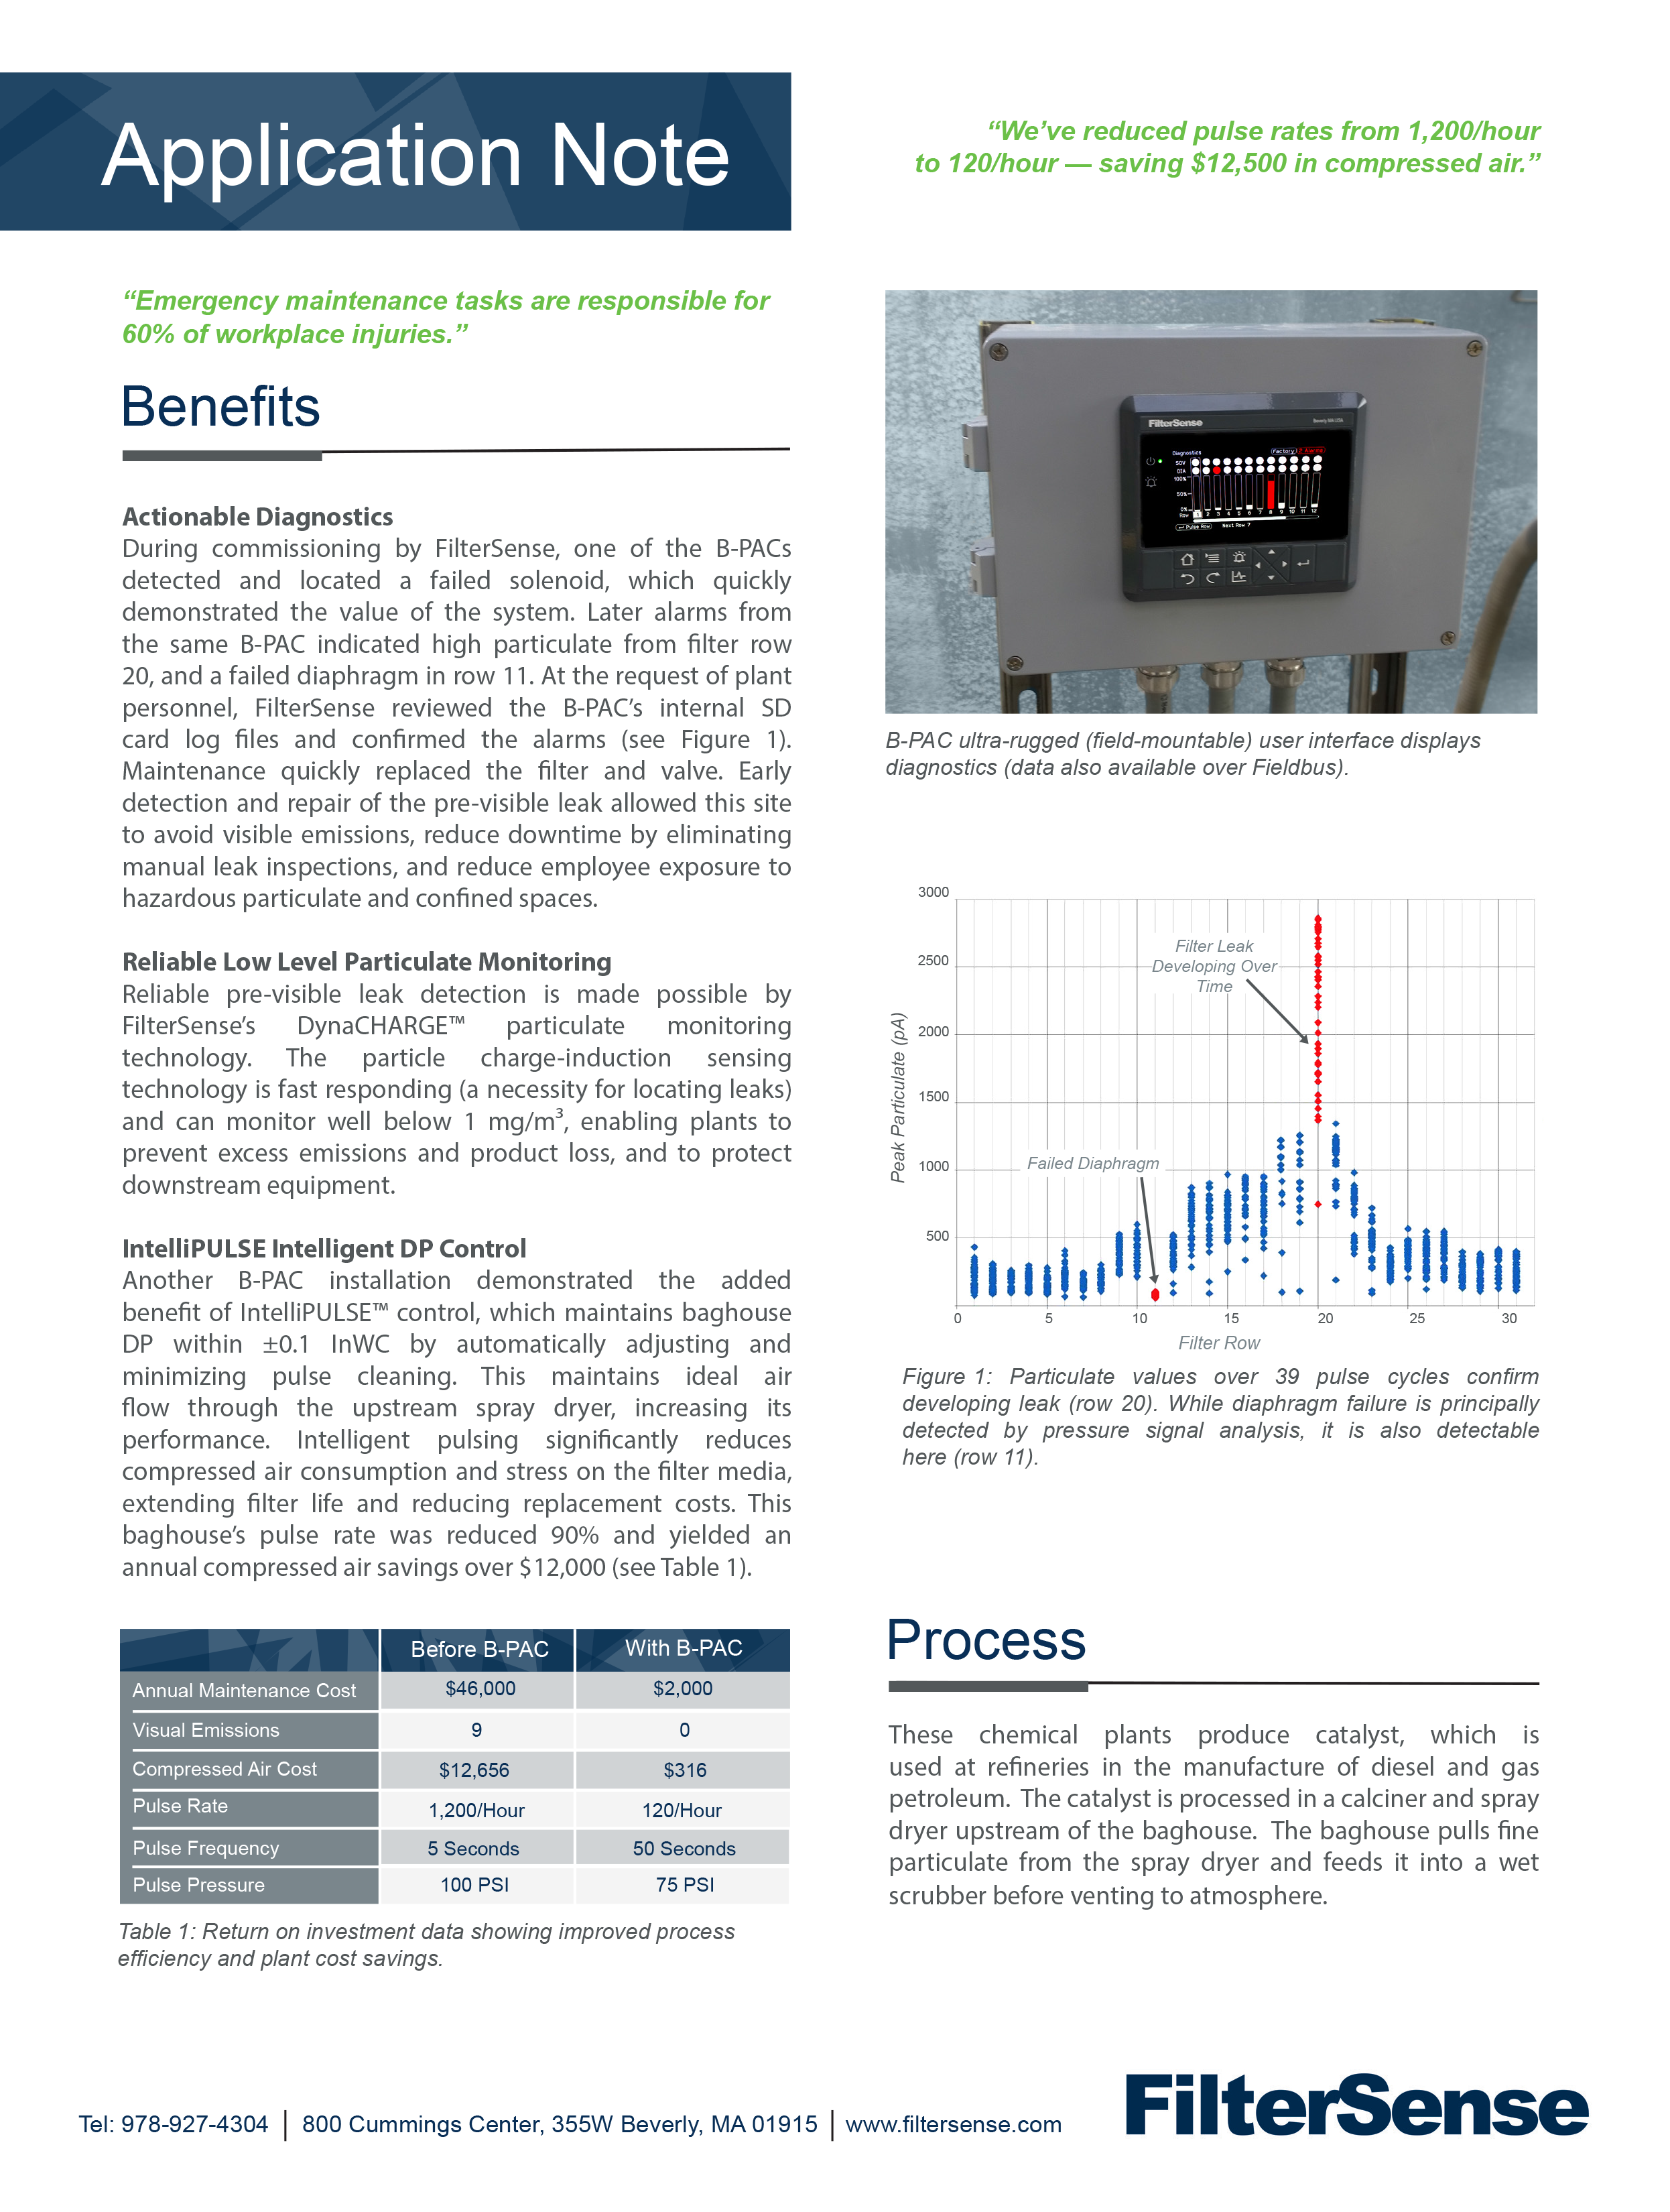 BASF Application Note Back